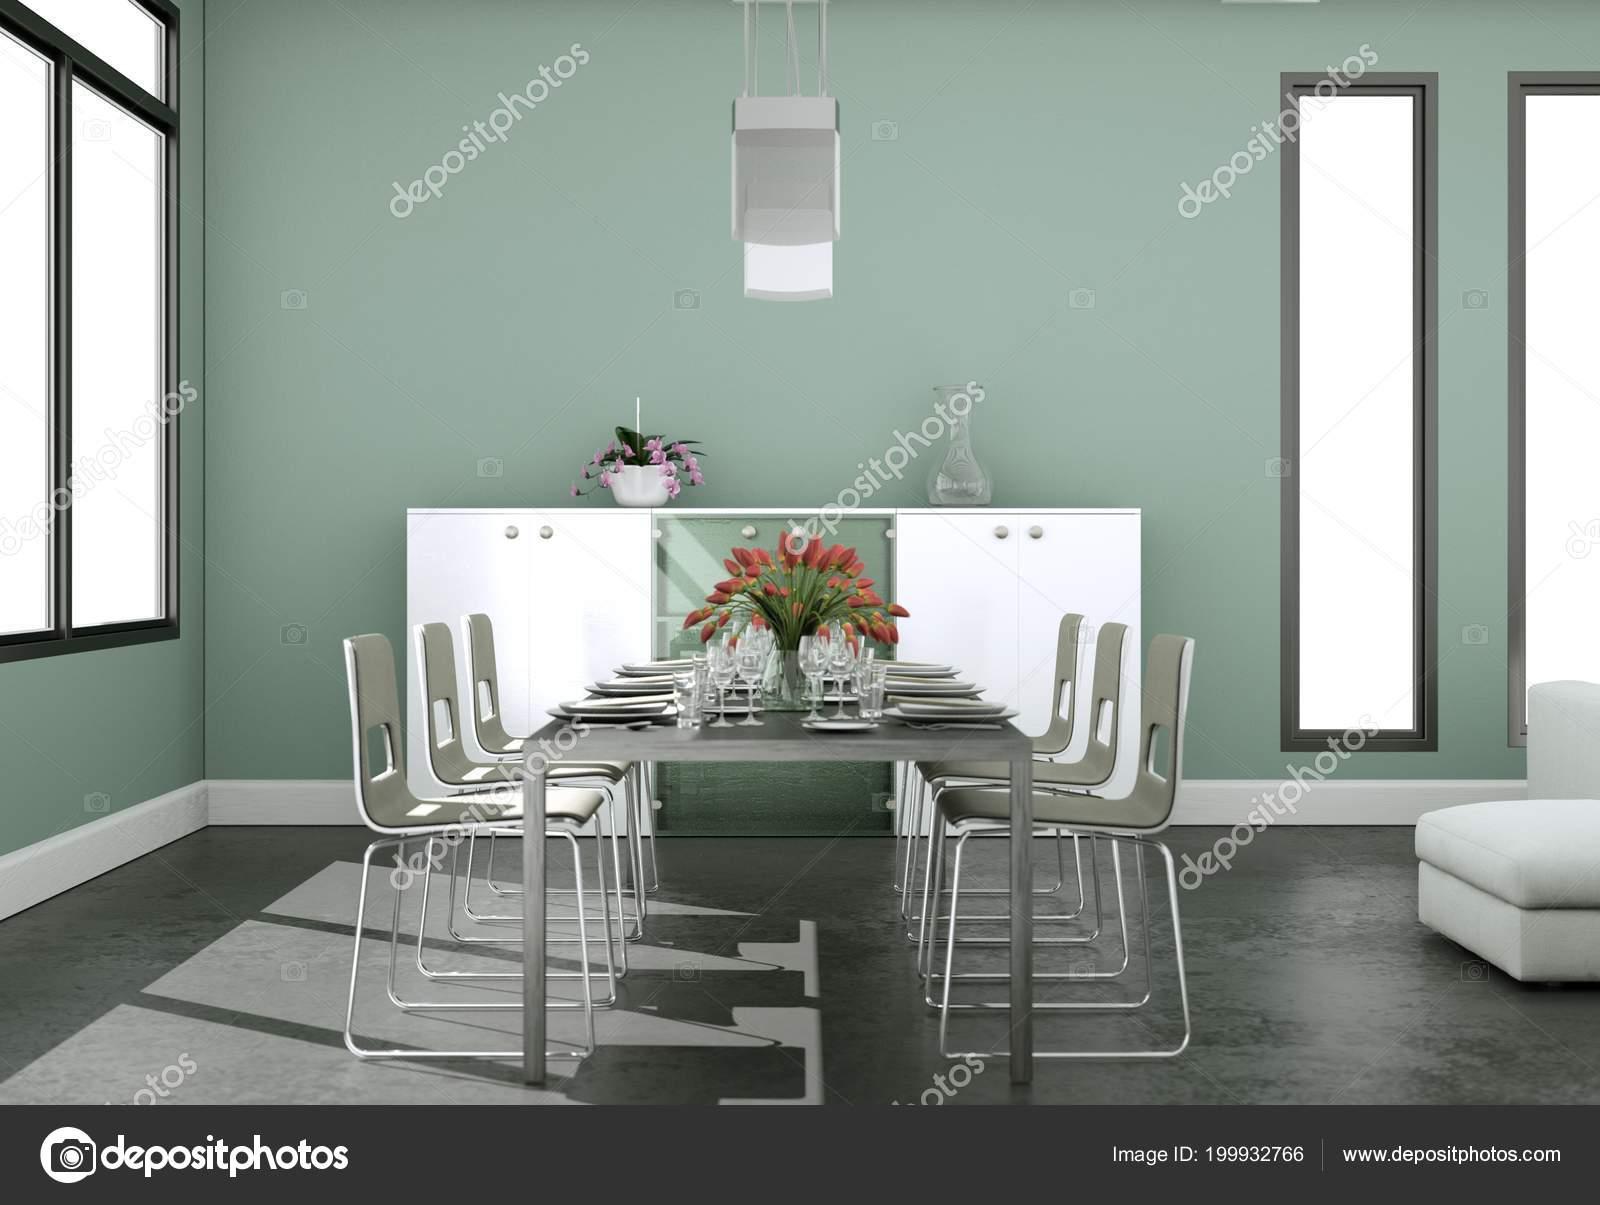 Dise o de interiores sala comedor en loft moderno foto for Diseno de interiores sala de estar comedor